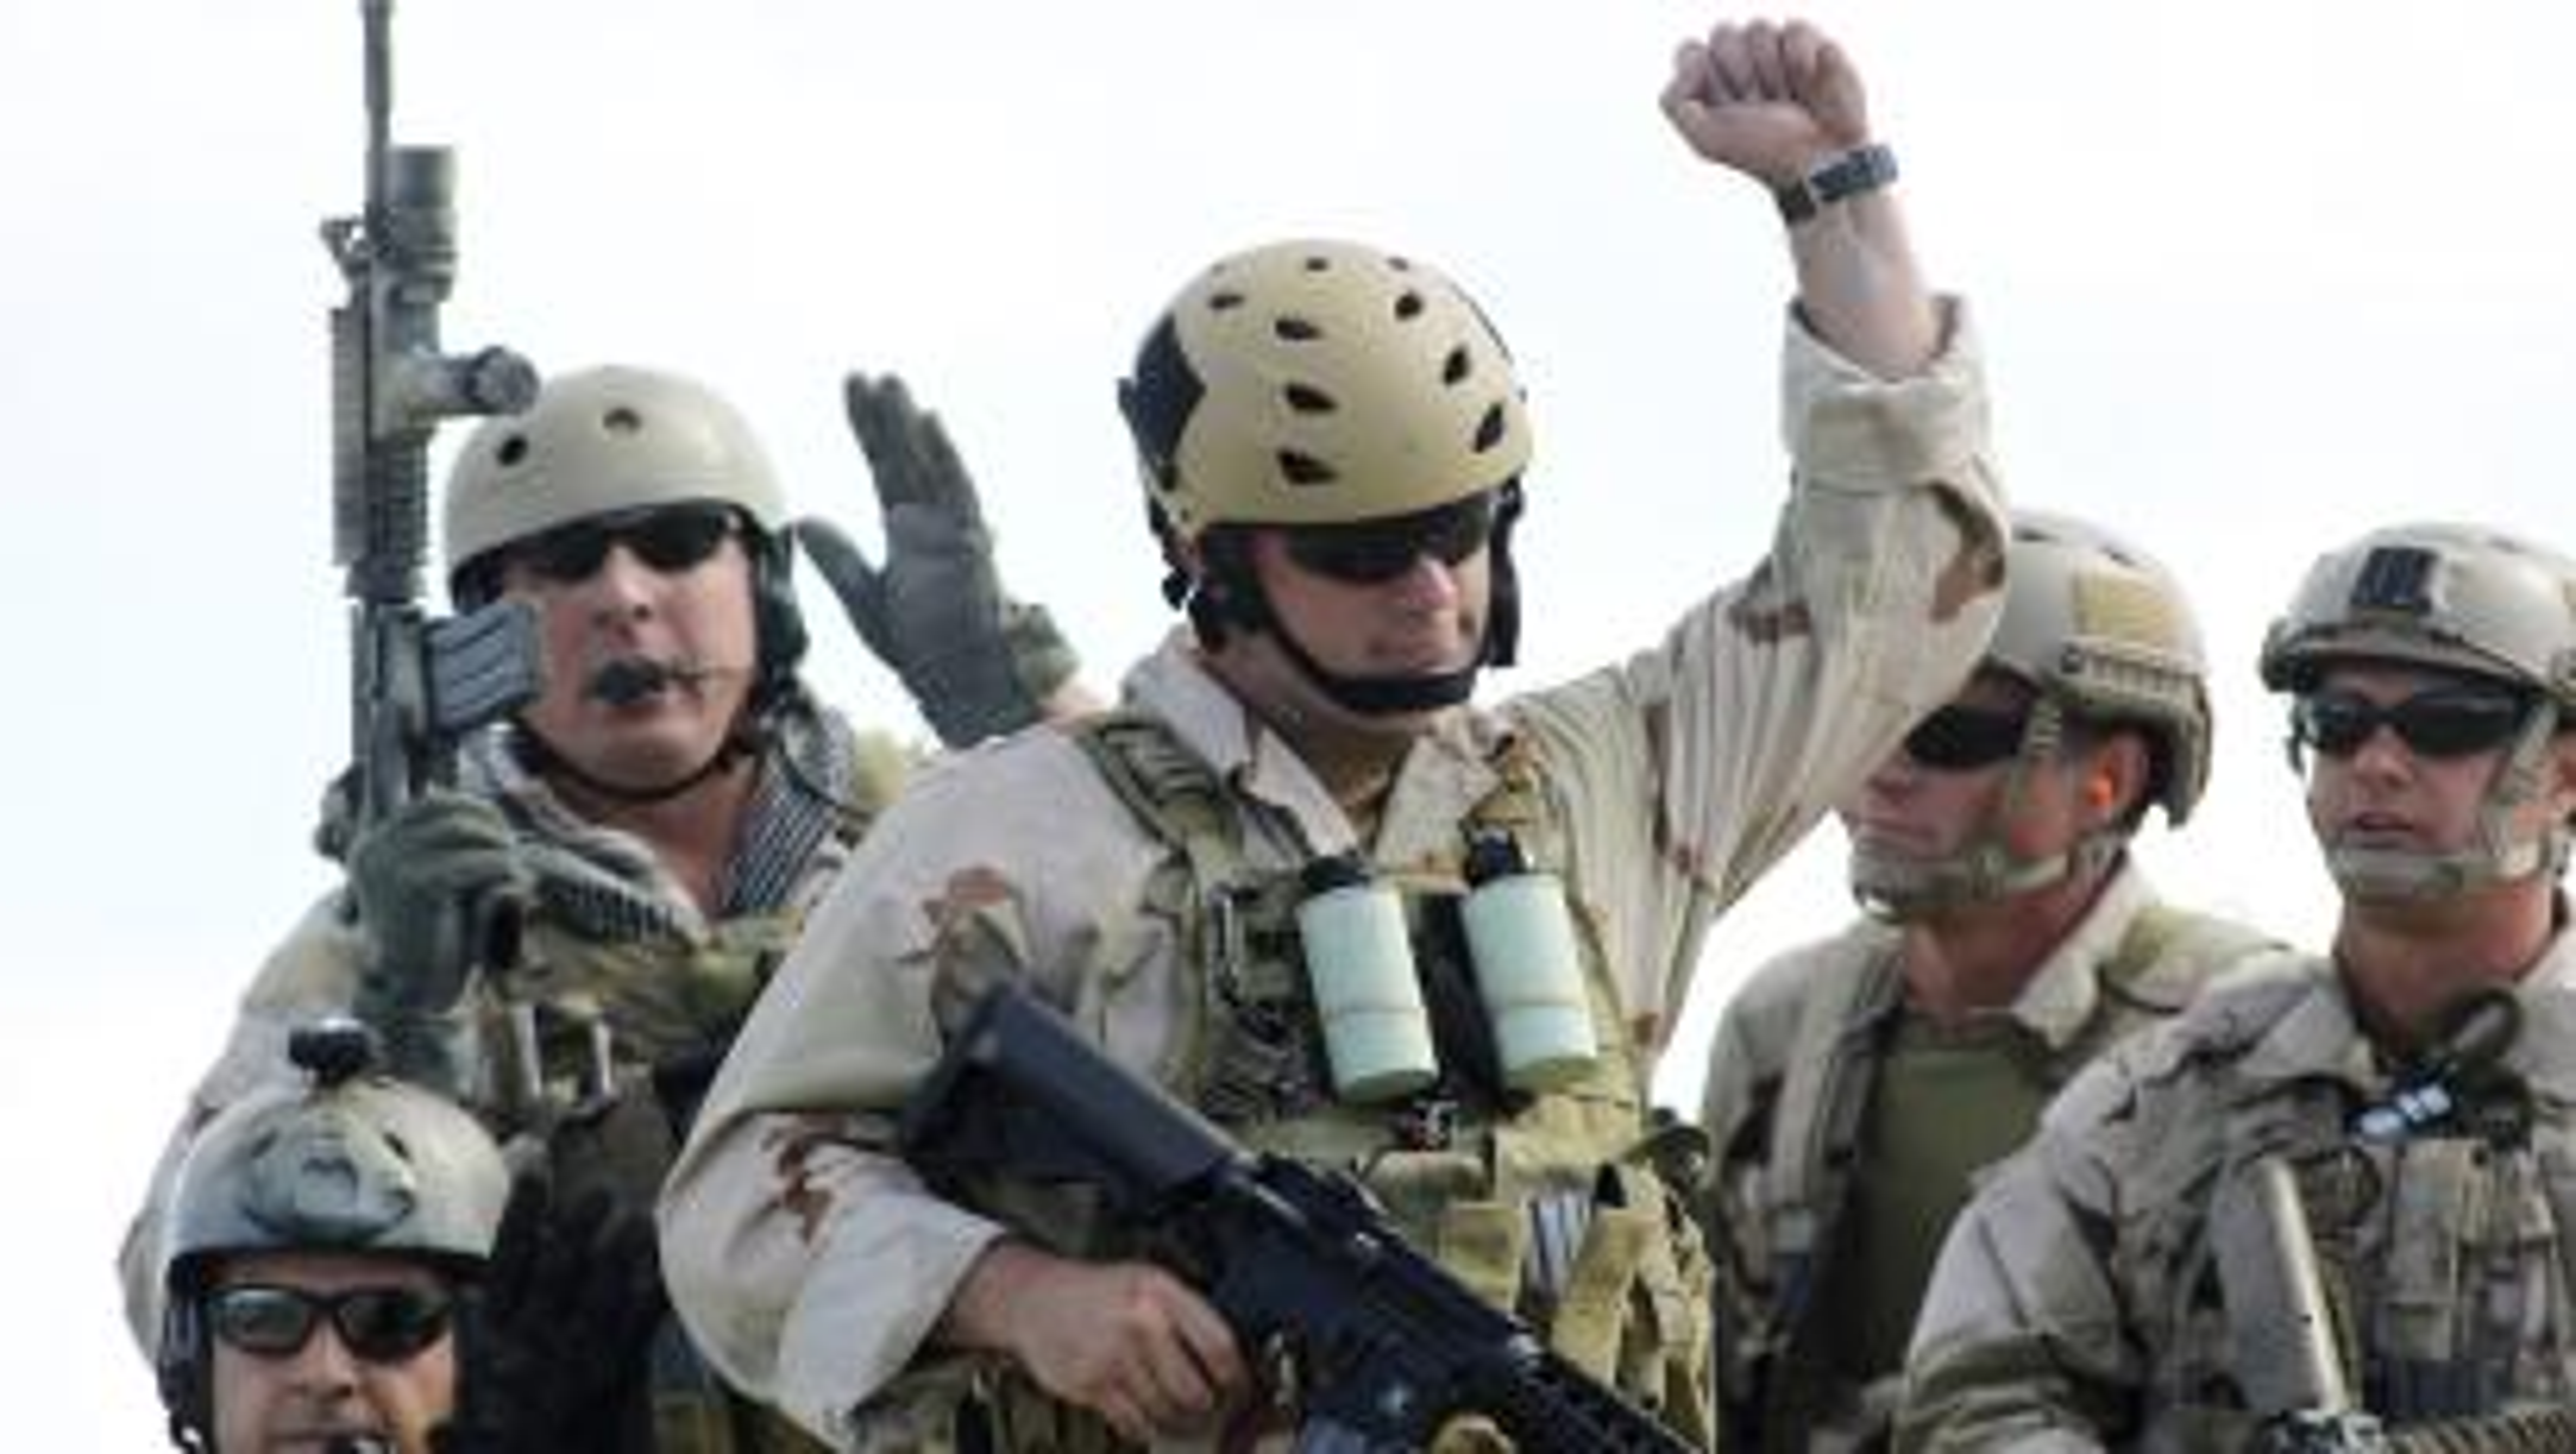 Why Google and Facebook are hiring Navy SEALs — Quartz